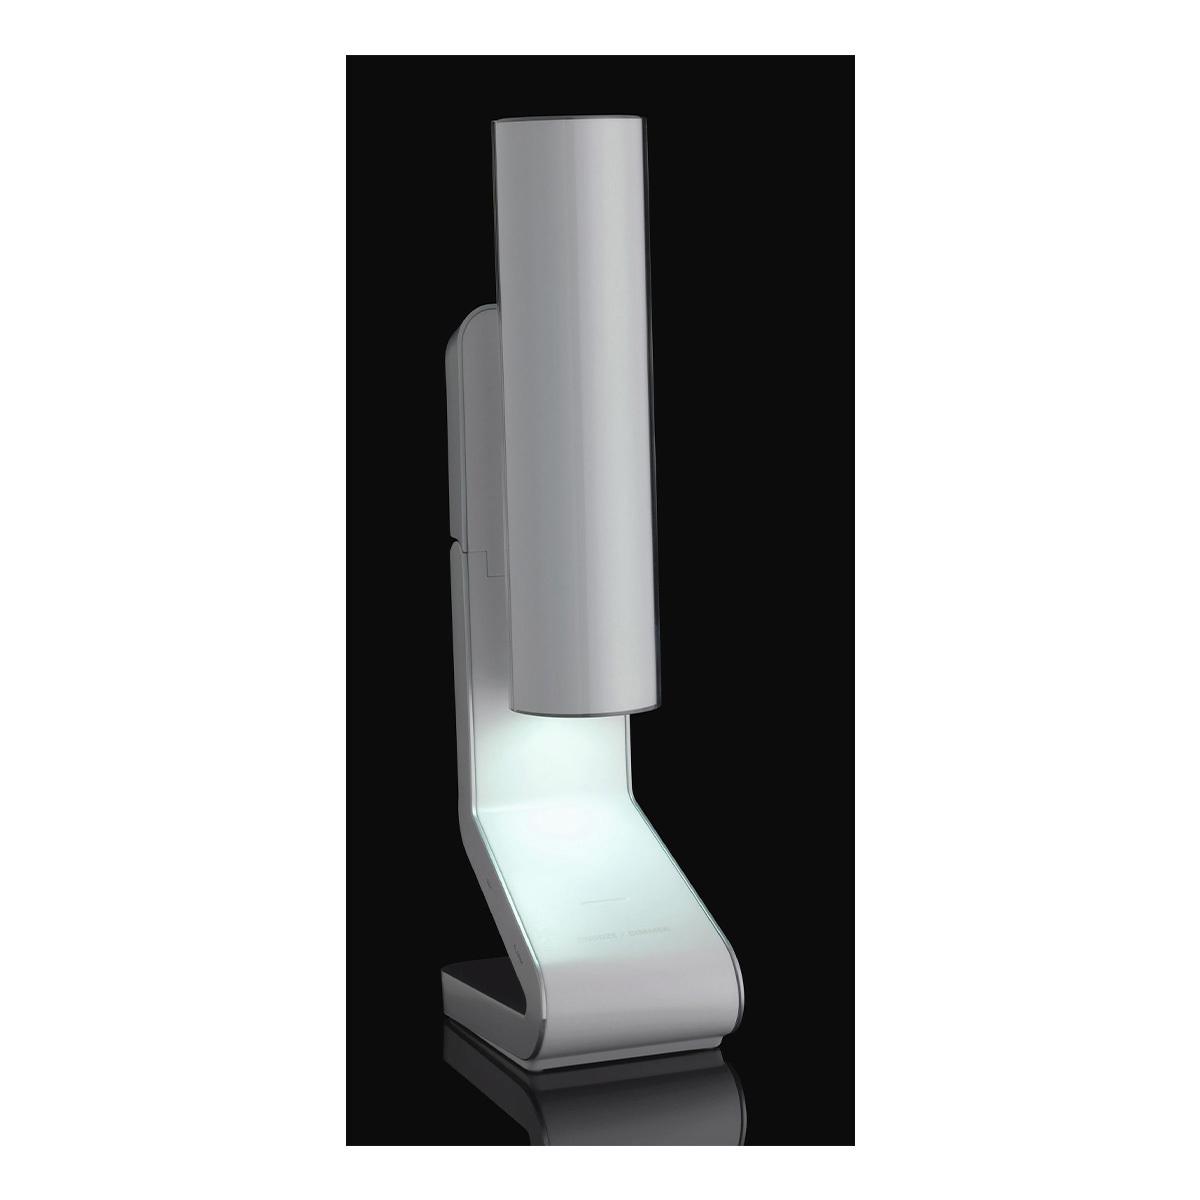 60-5004-led-lampe-mit-funk-projektions-wecker-light-tube-beleuchtung-1200x1200px.jpg